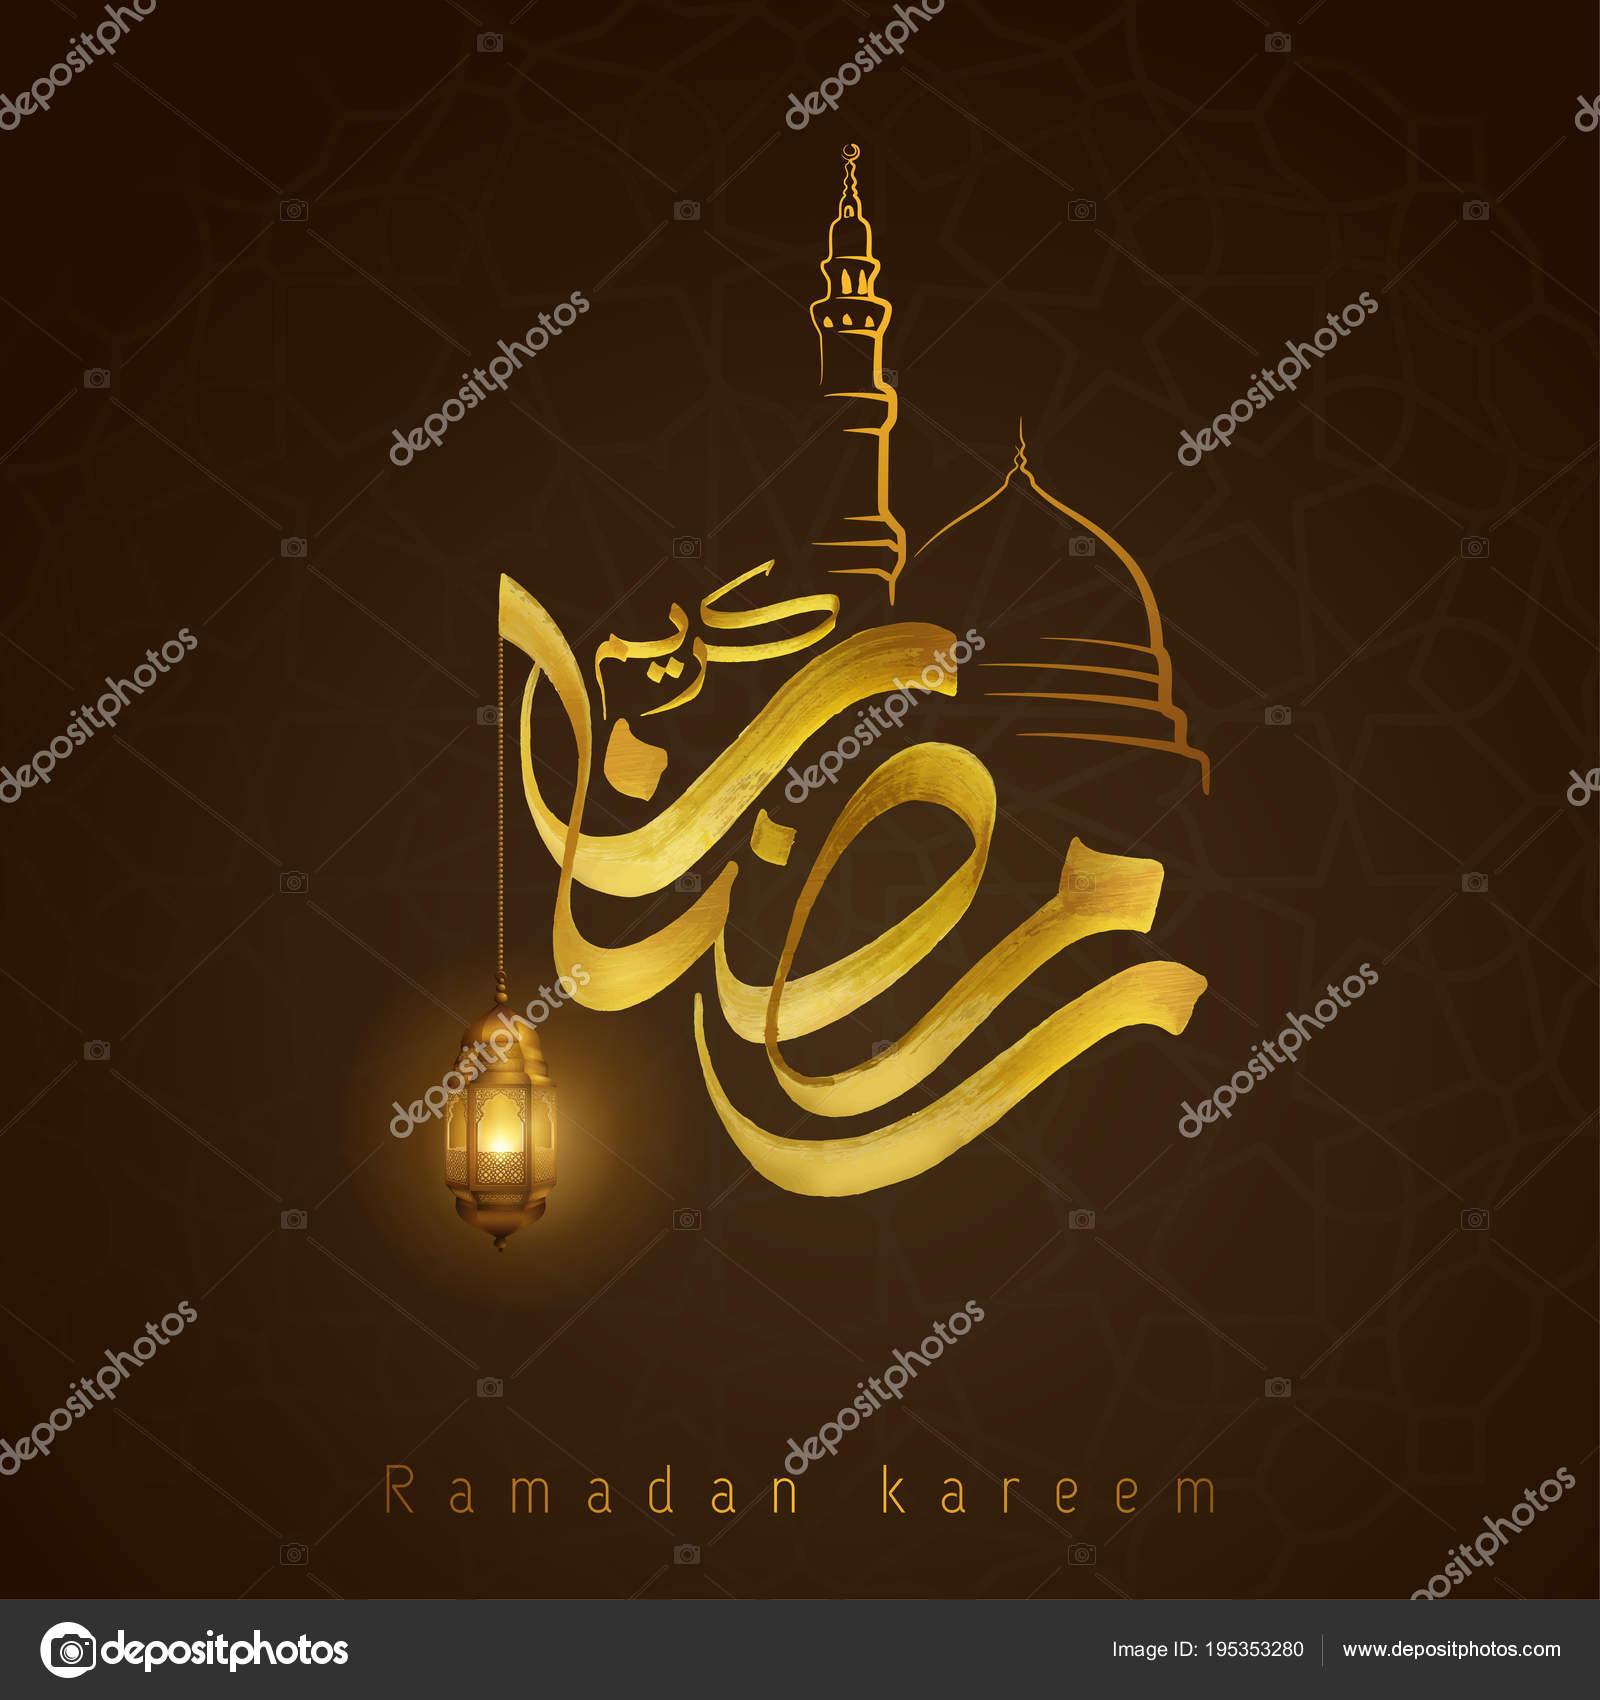 Ramadan Kareem Greeting Card Template Arabic Calligraphy Glow